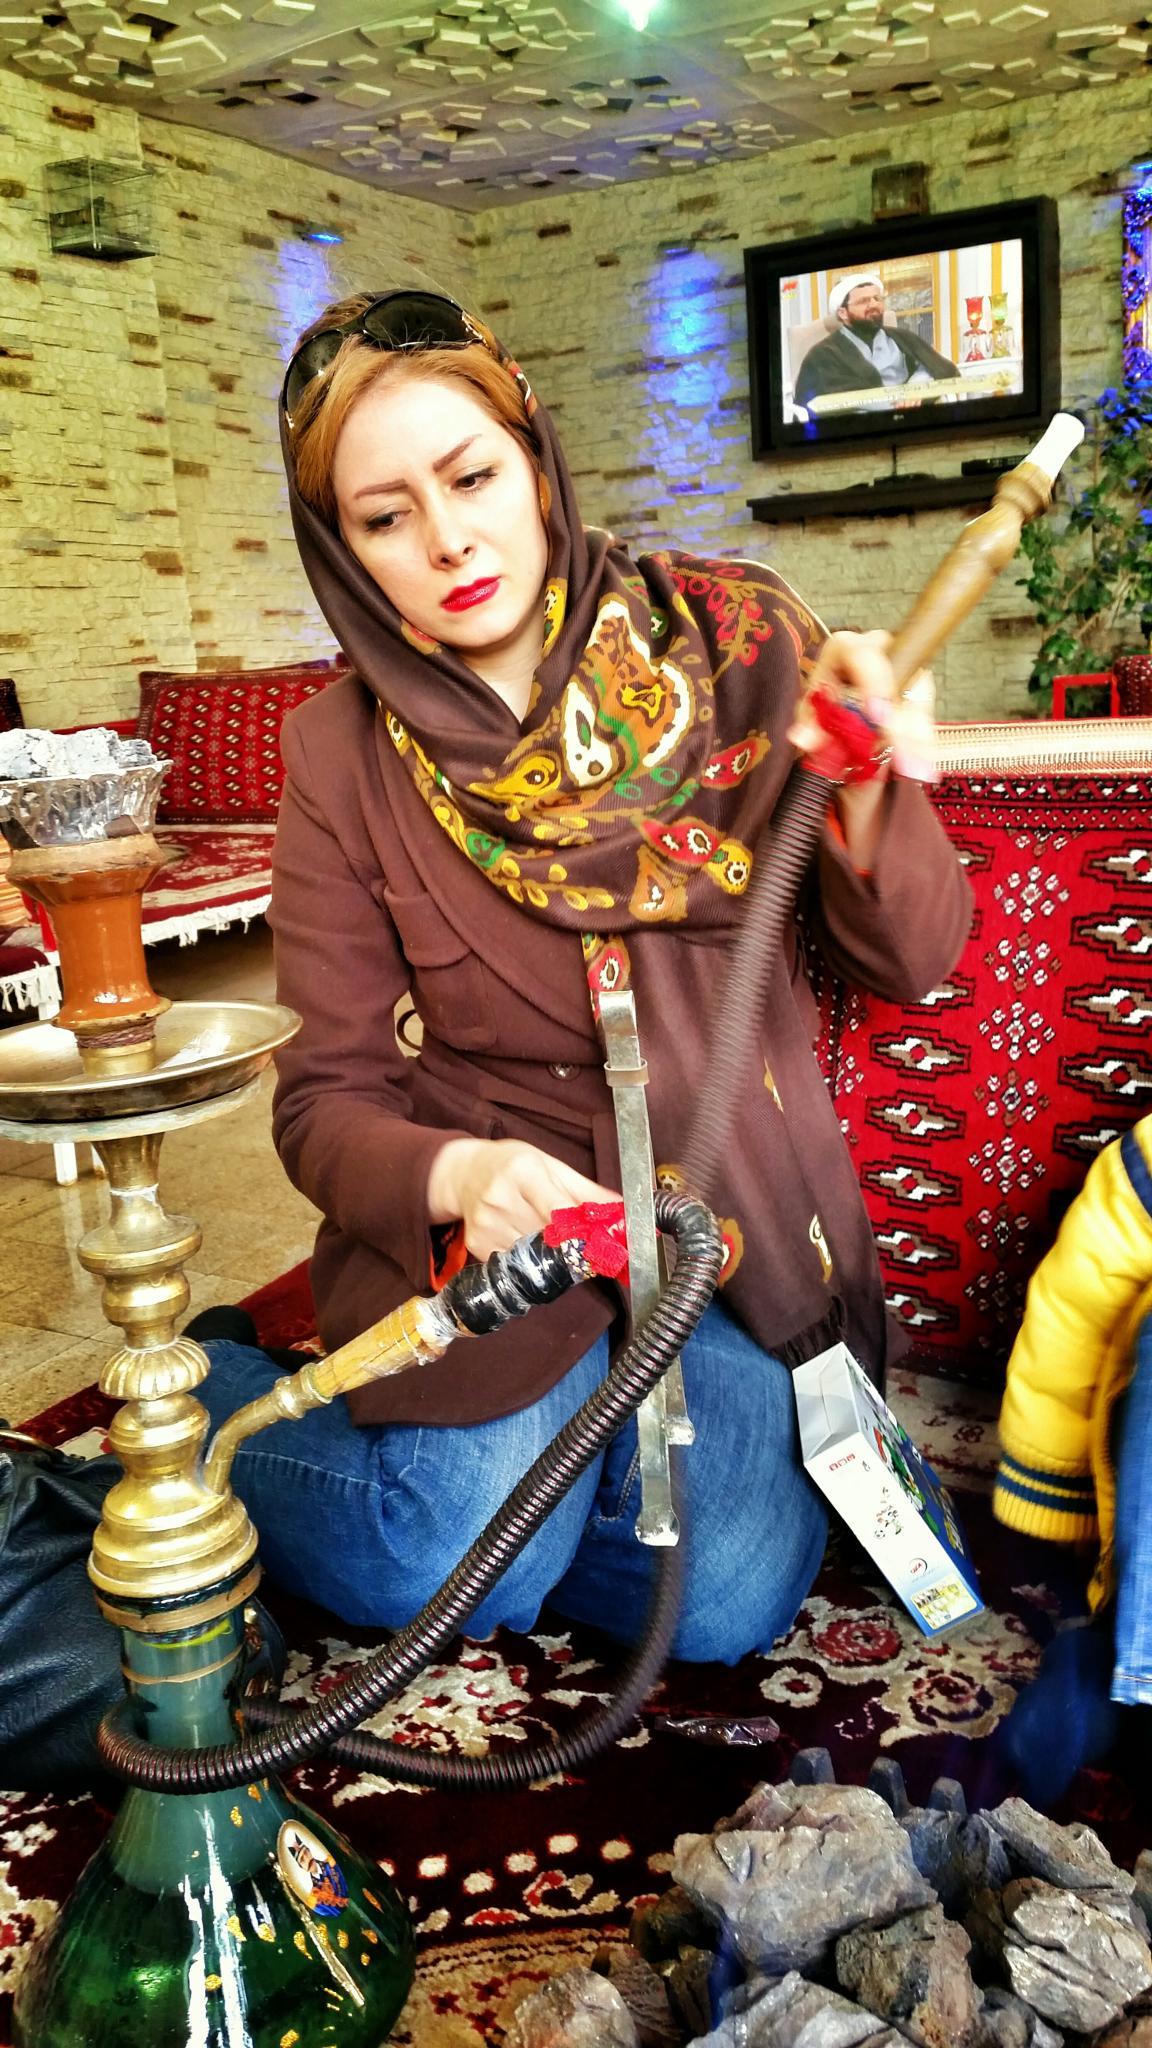 Iranian woman smoking a waterpipe in Darband, Tehran, Iran.  by Henry Kolder